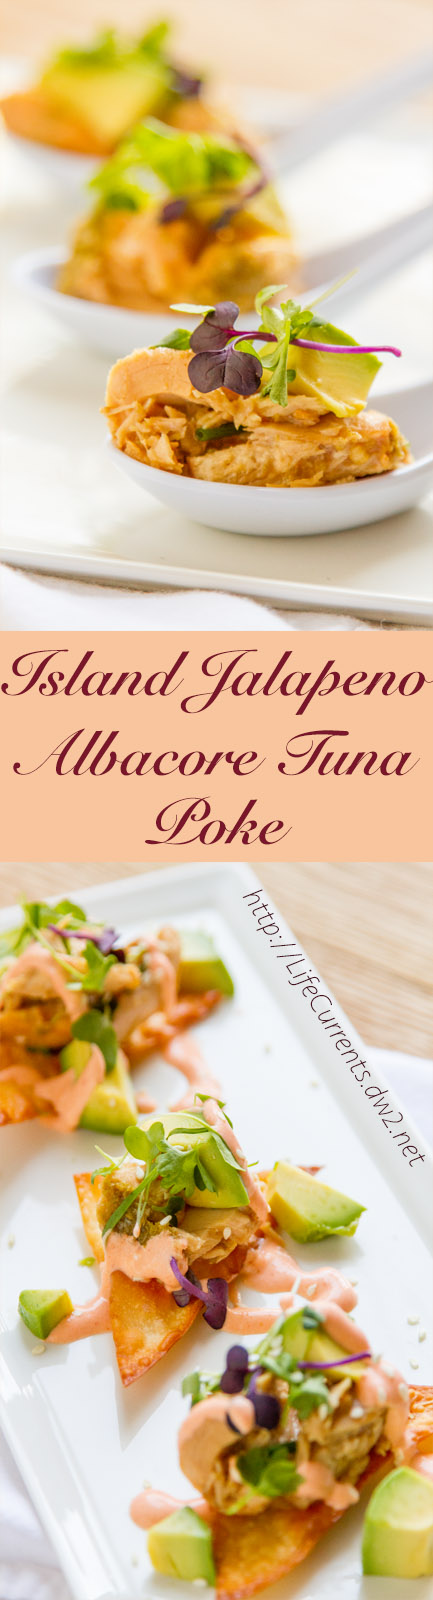 Island Jalapeno Albacore Tuna Poke Recipe